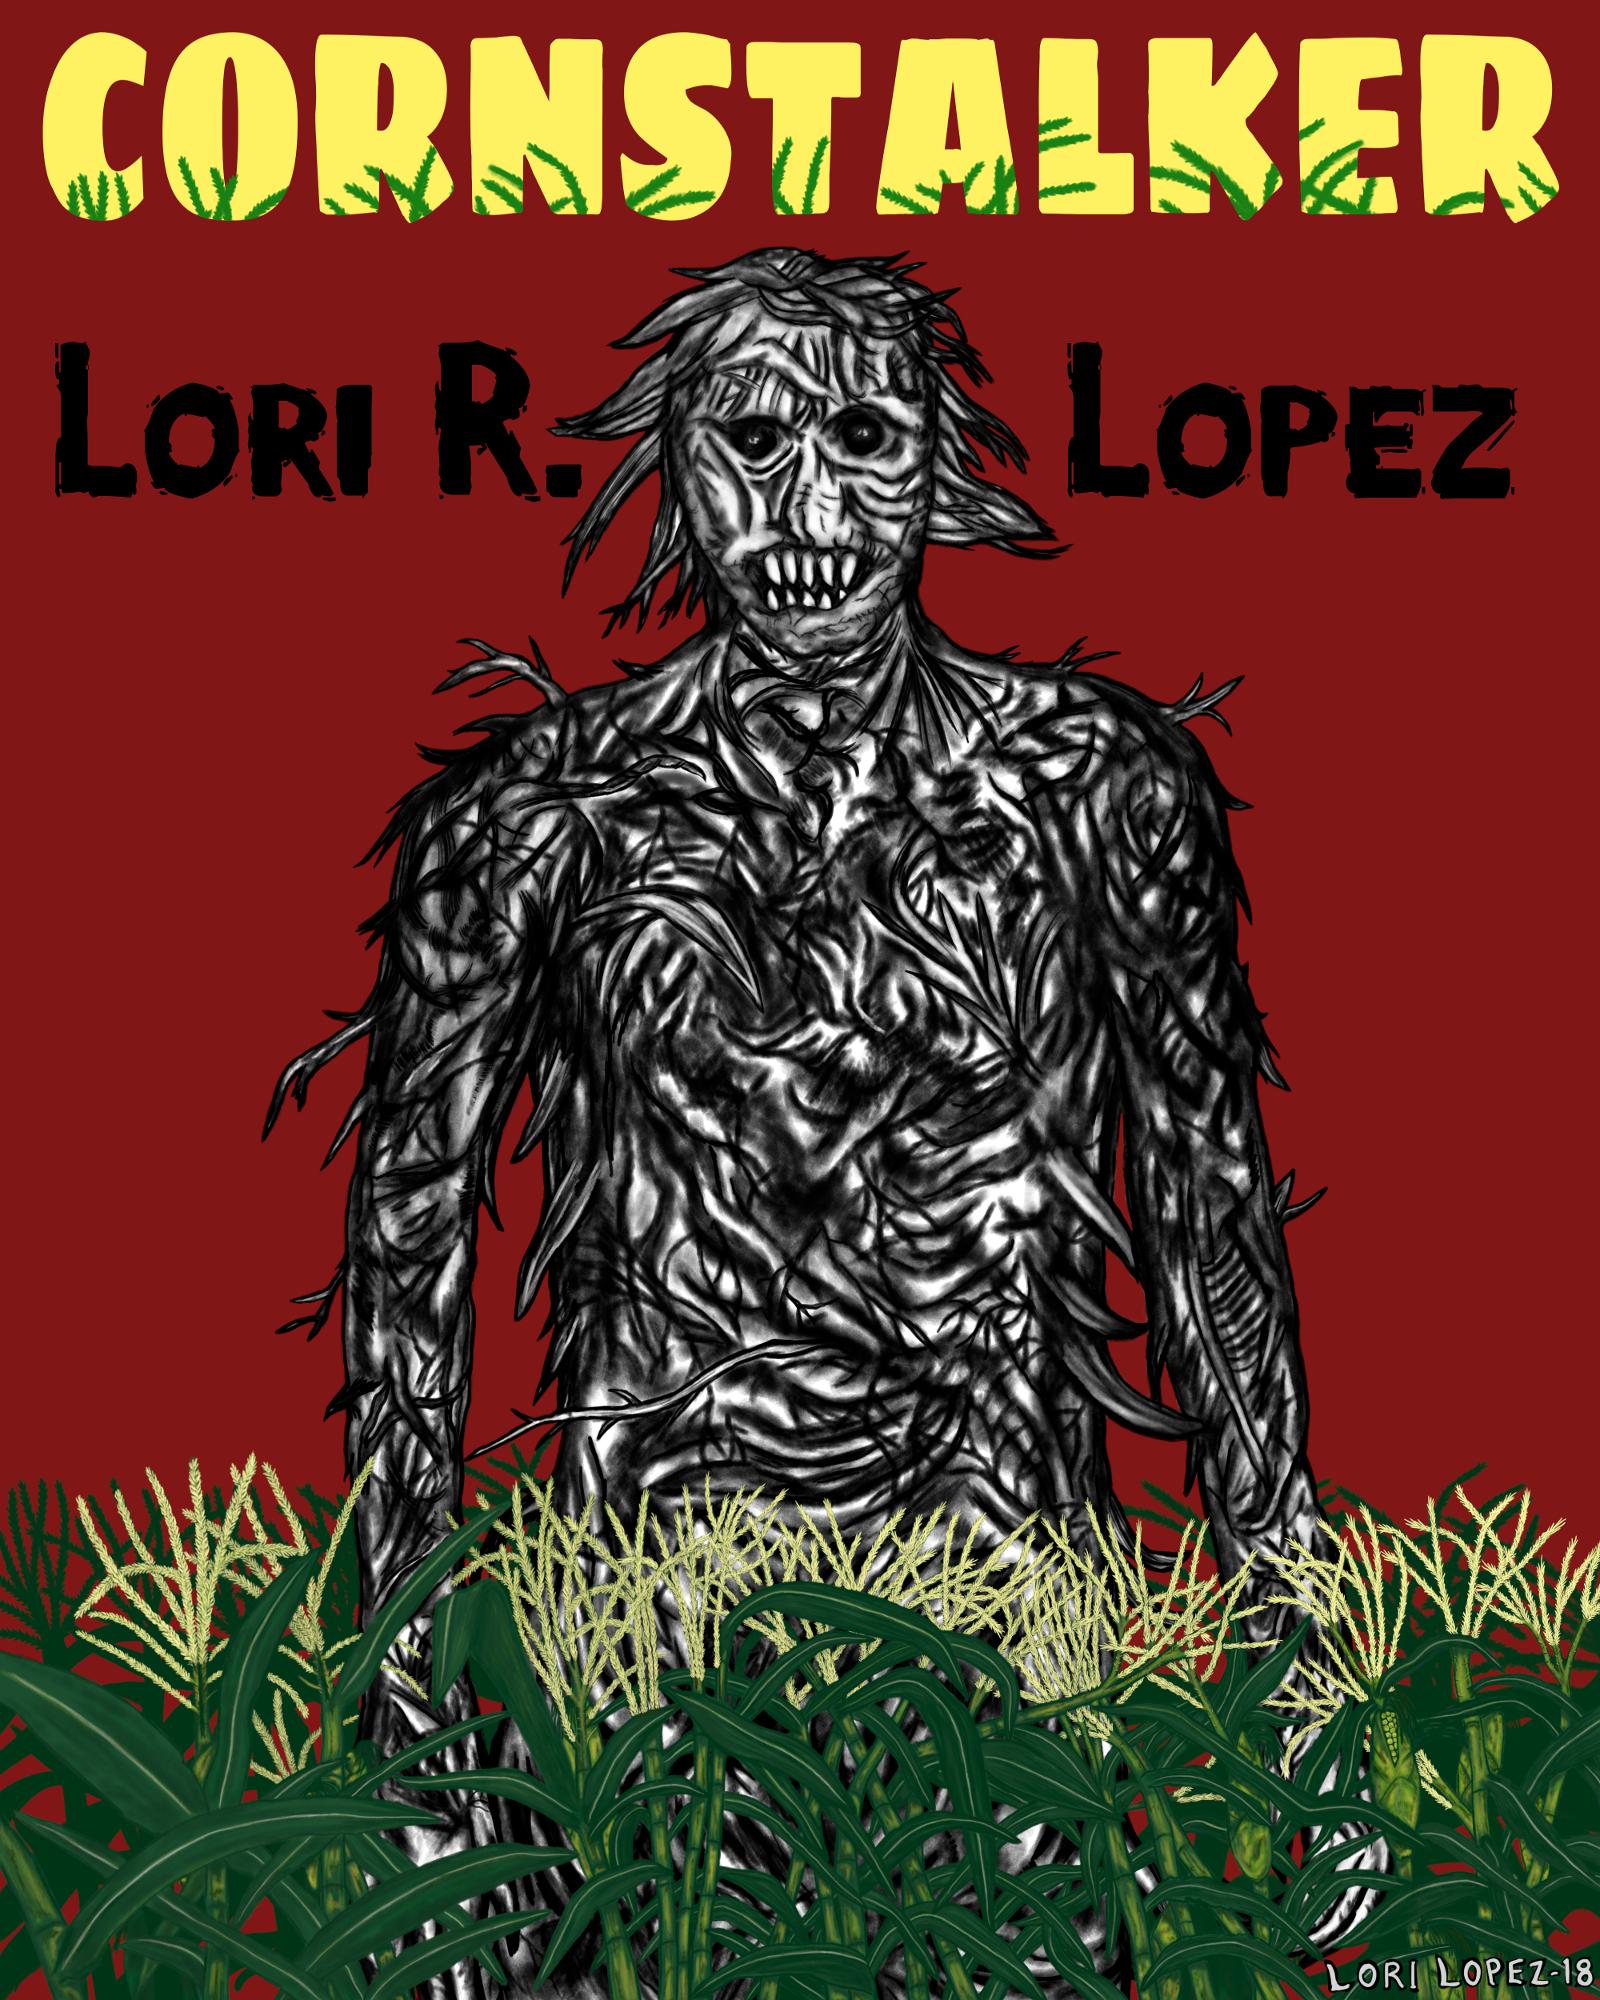 The Art of Lori R. Lopez 17